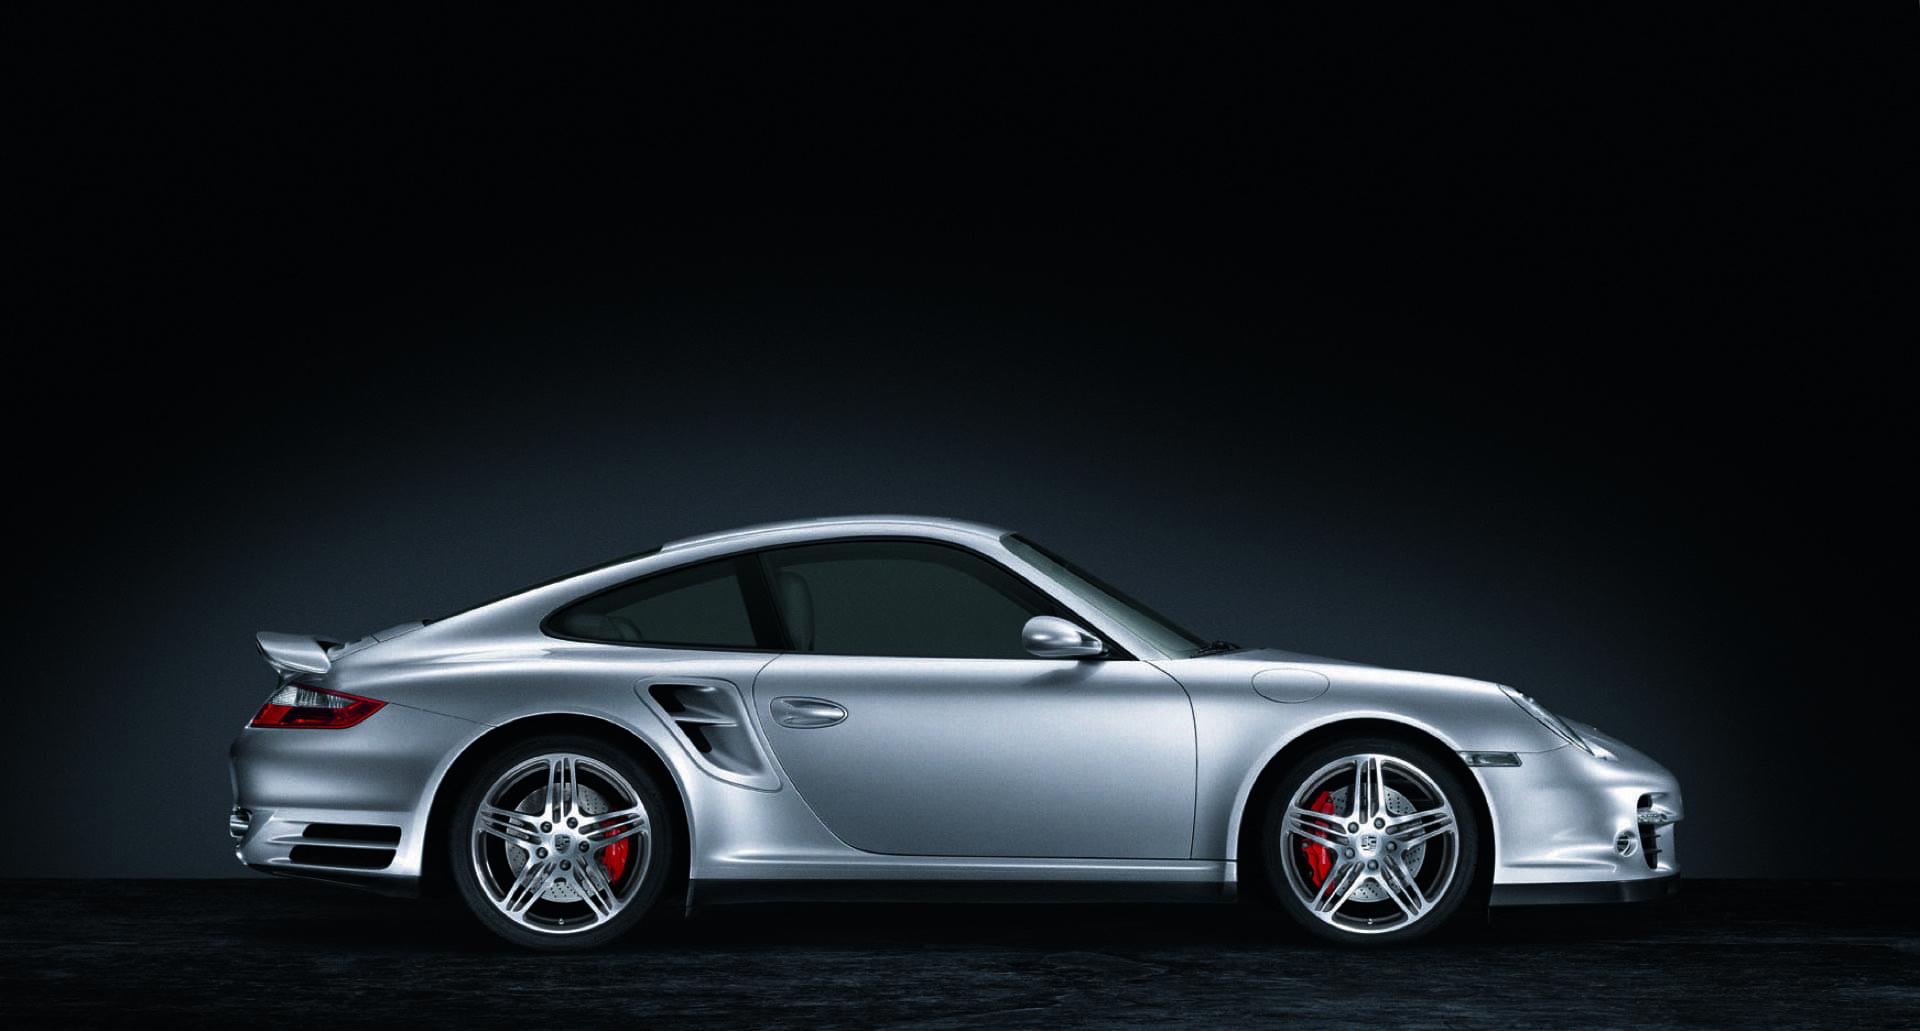 Porsche 911 997 Turbo 2006